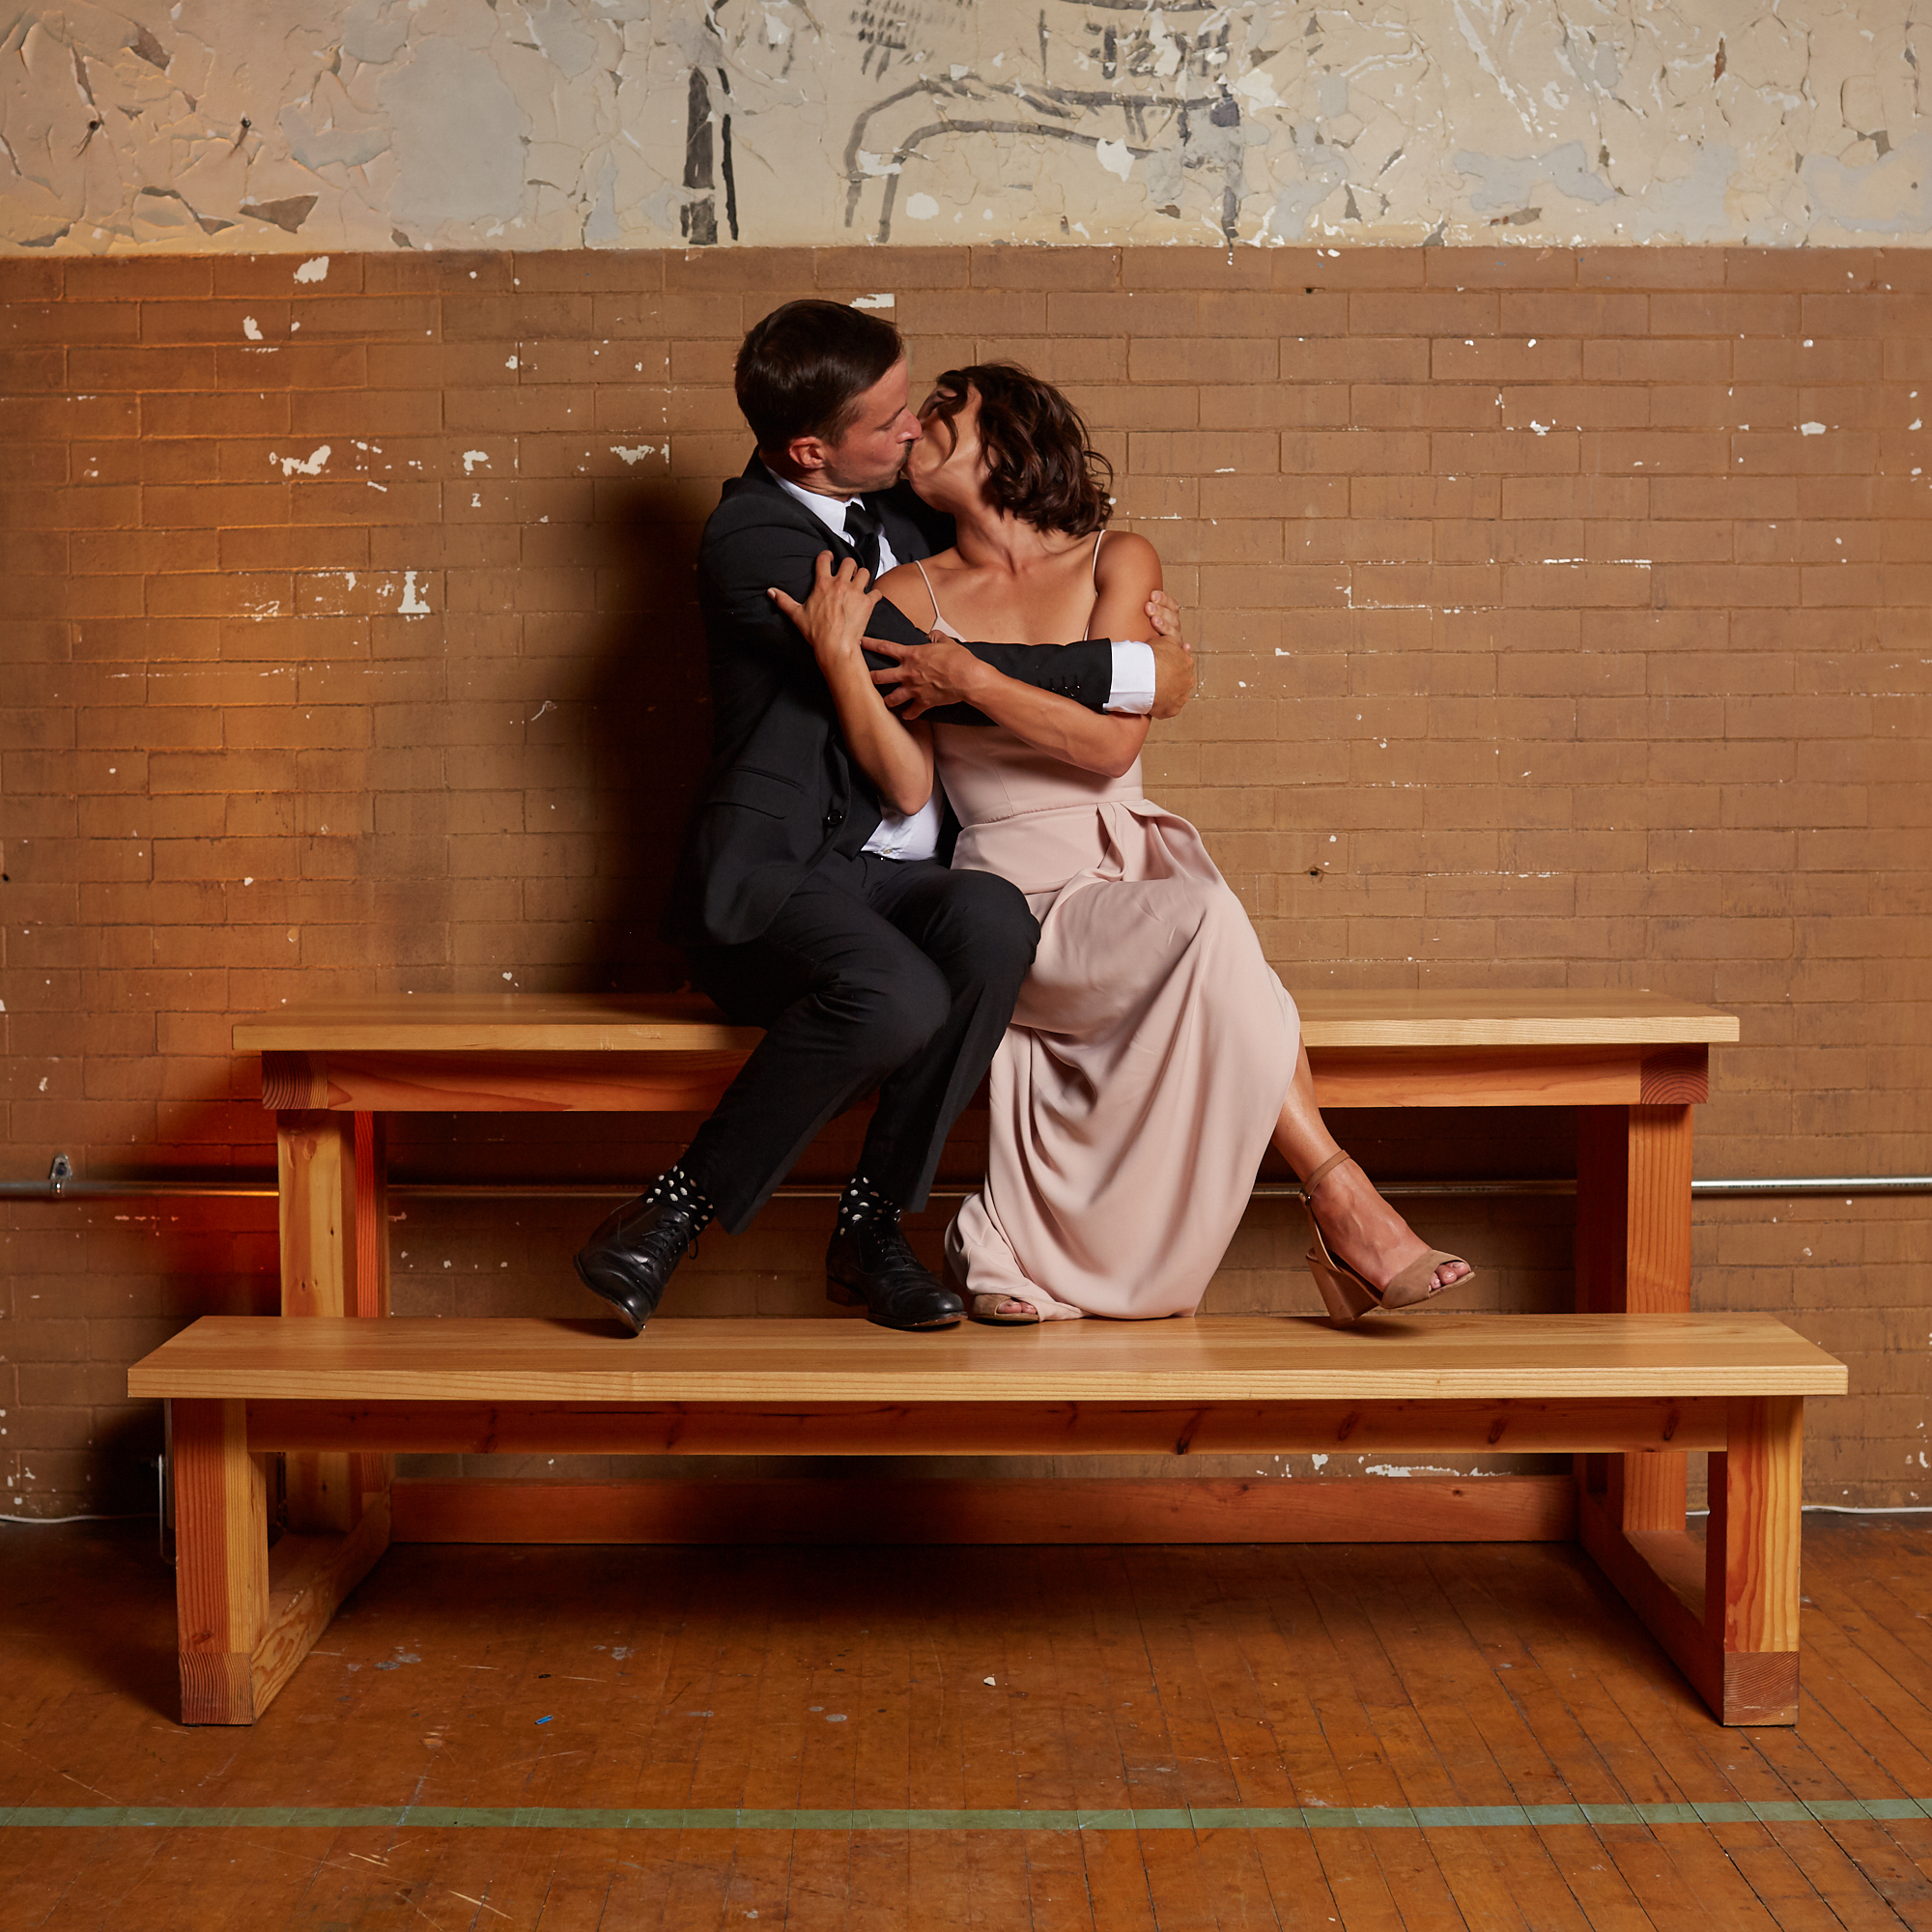 Ryan Hannah Sims - 2017.09 - Wedding Photos - 1028.jpg